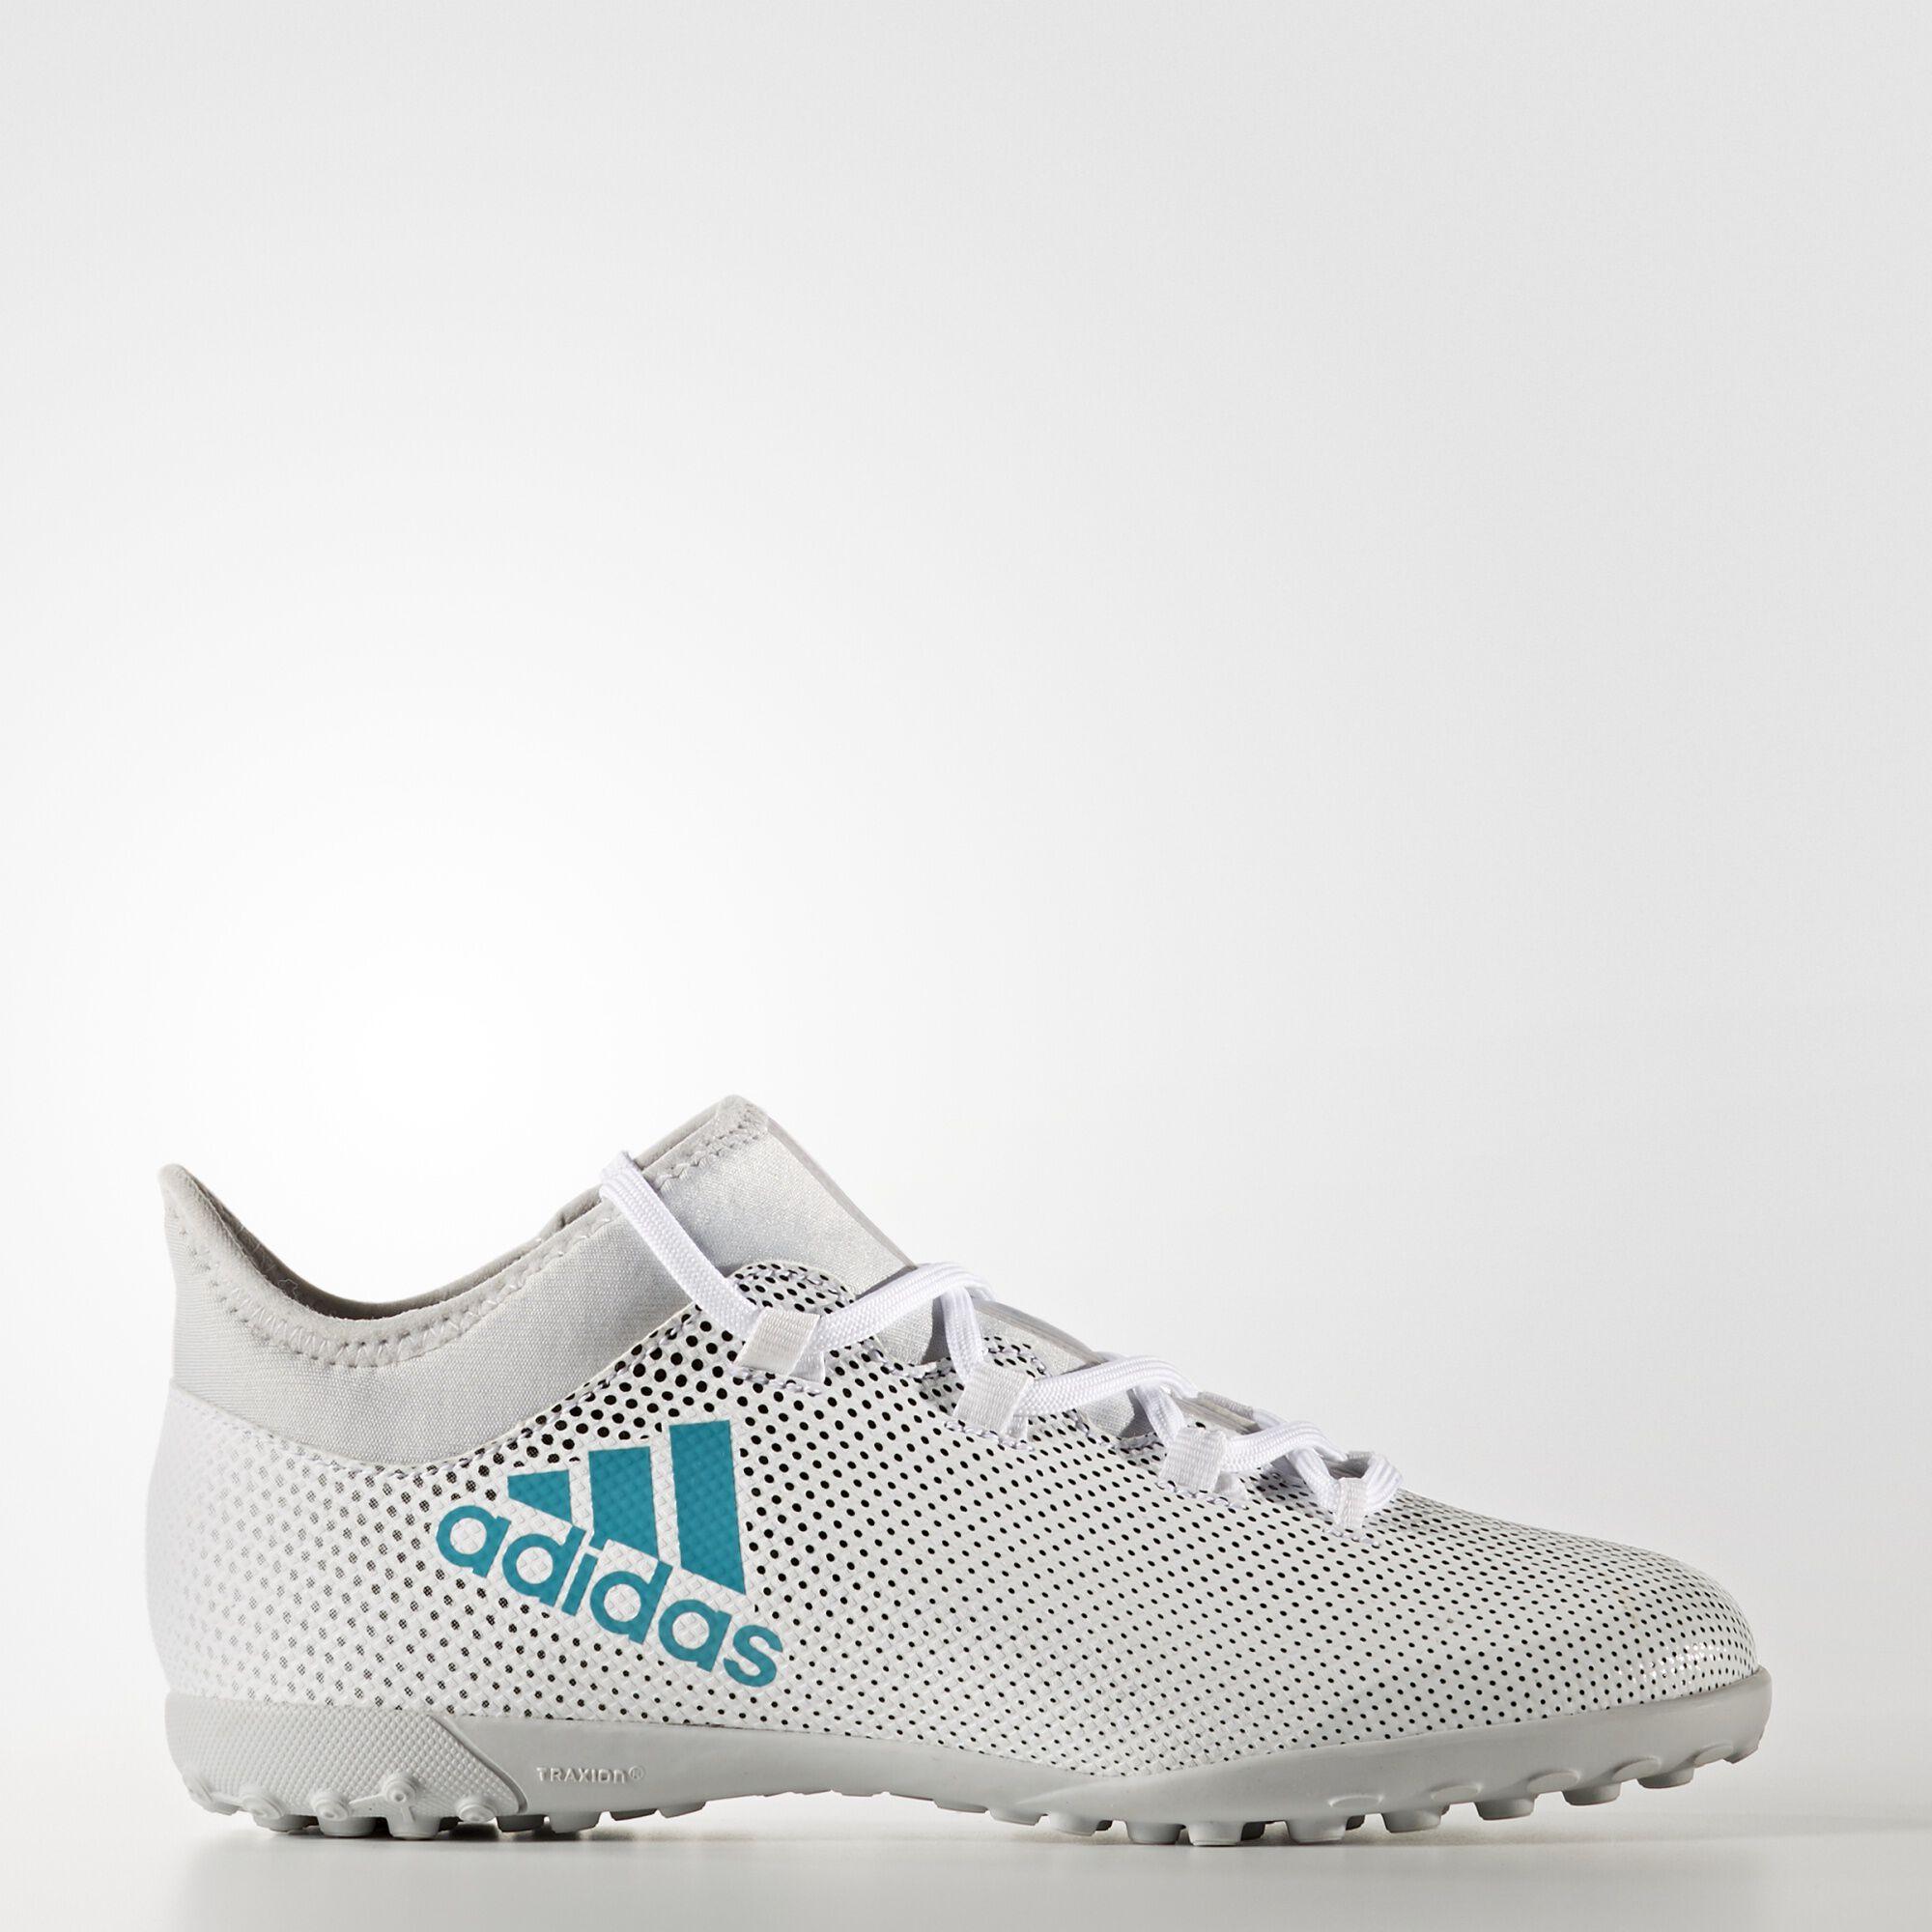 55c4e9e01 adidas x tango 17+ purespeed in; adidas x tango 17.3 turf shoes running  white ftw energy blue black cg3731